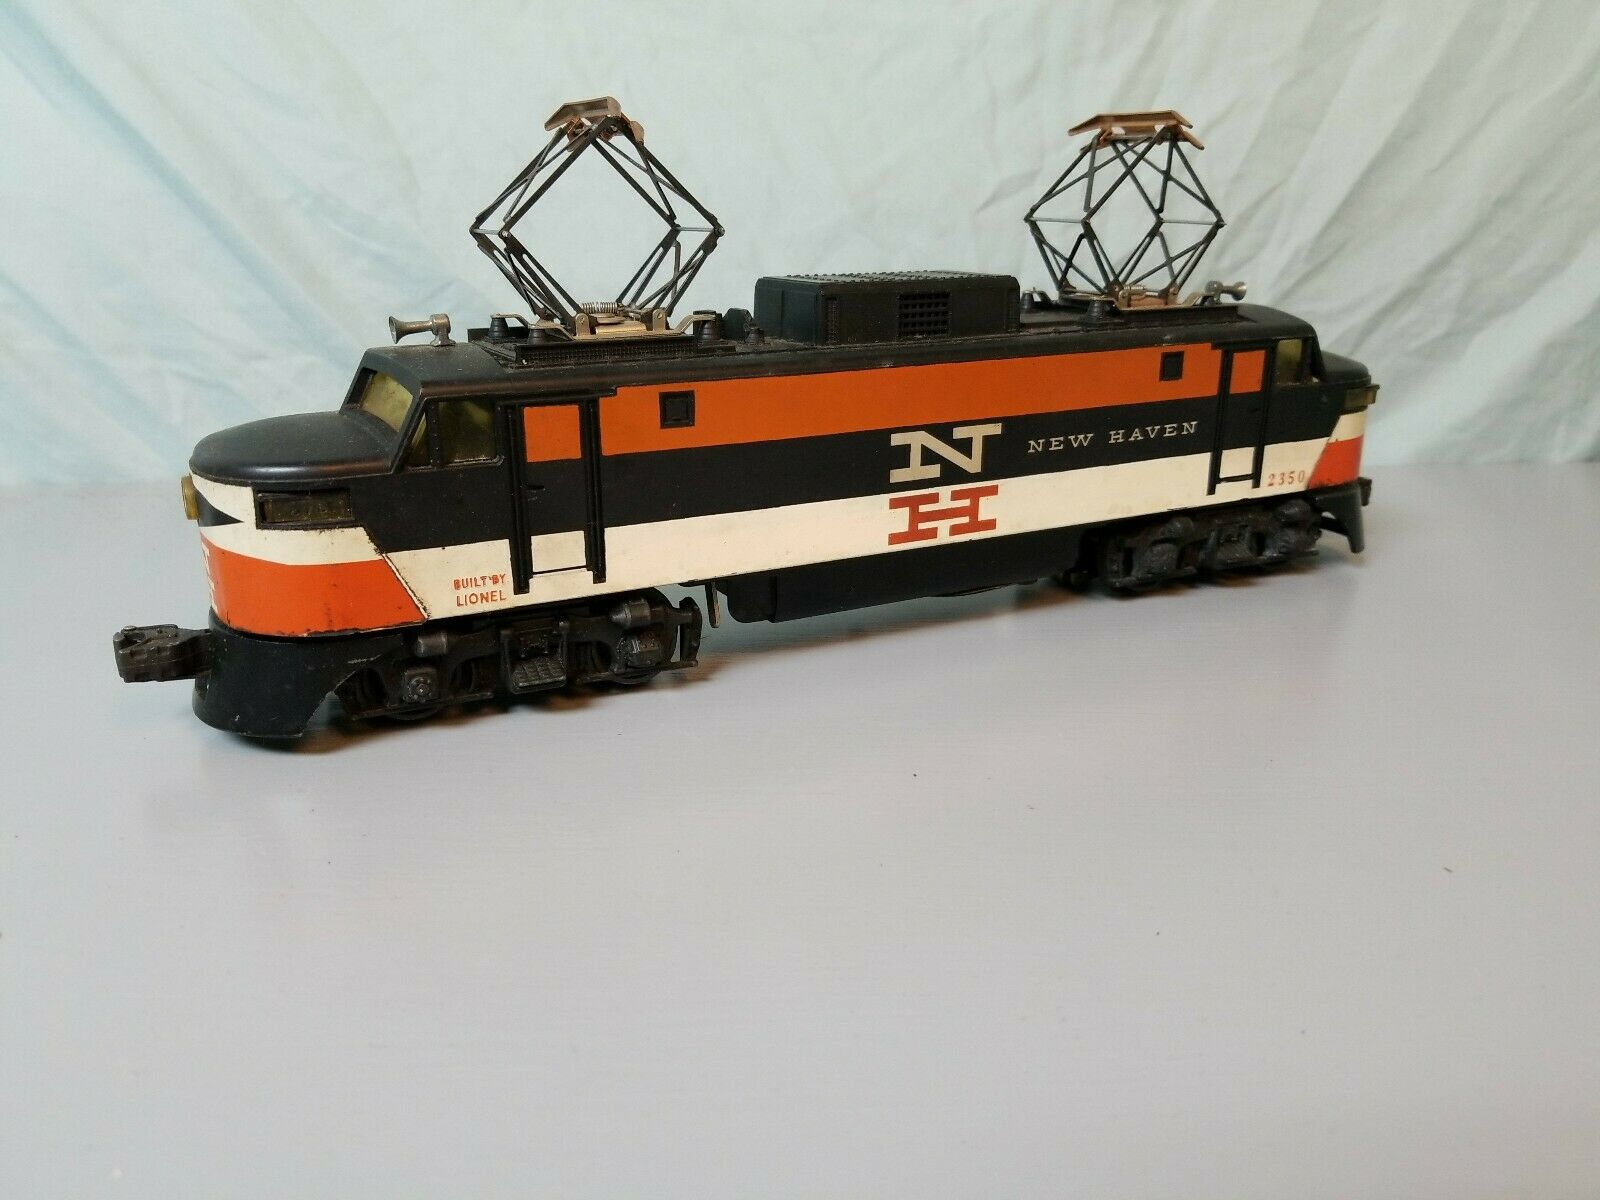 Postwar Lionel 2350 nuovo Haven EP5 Locomotive